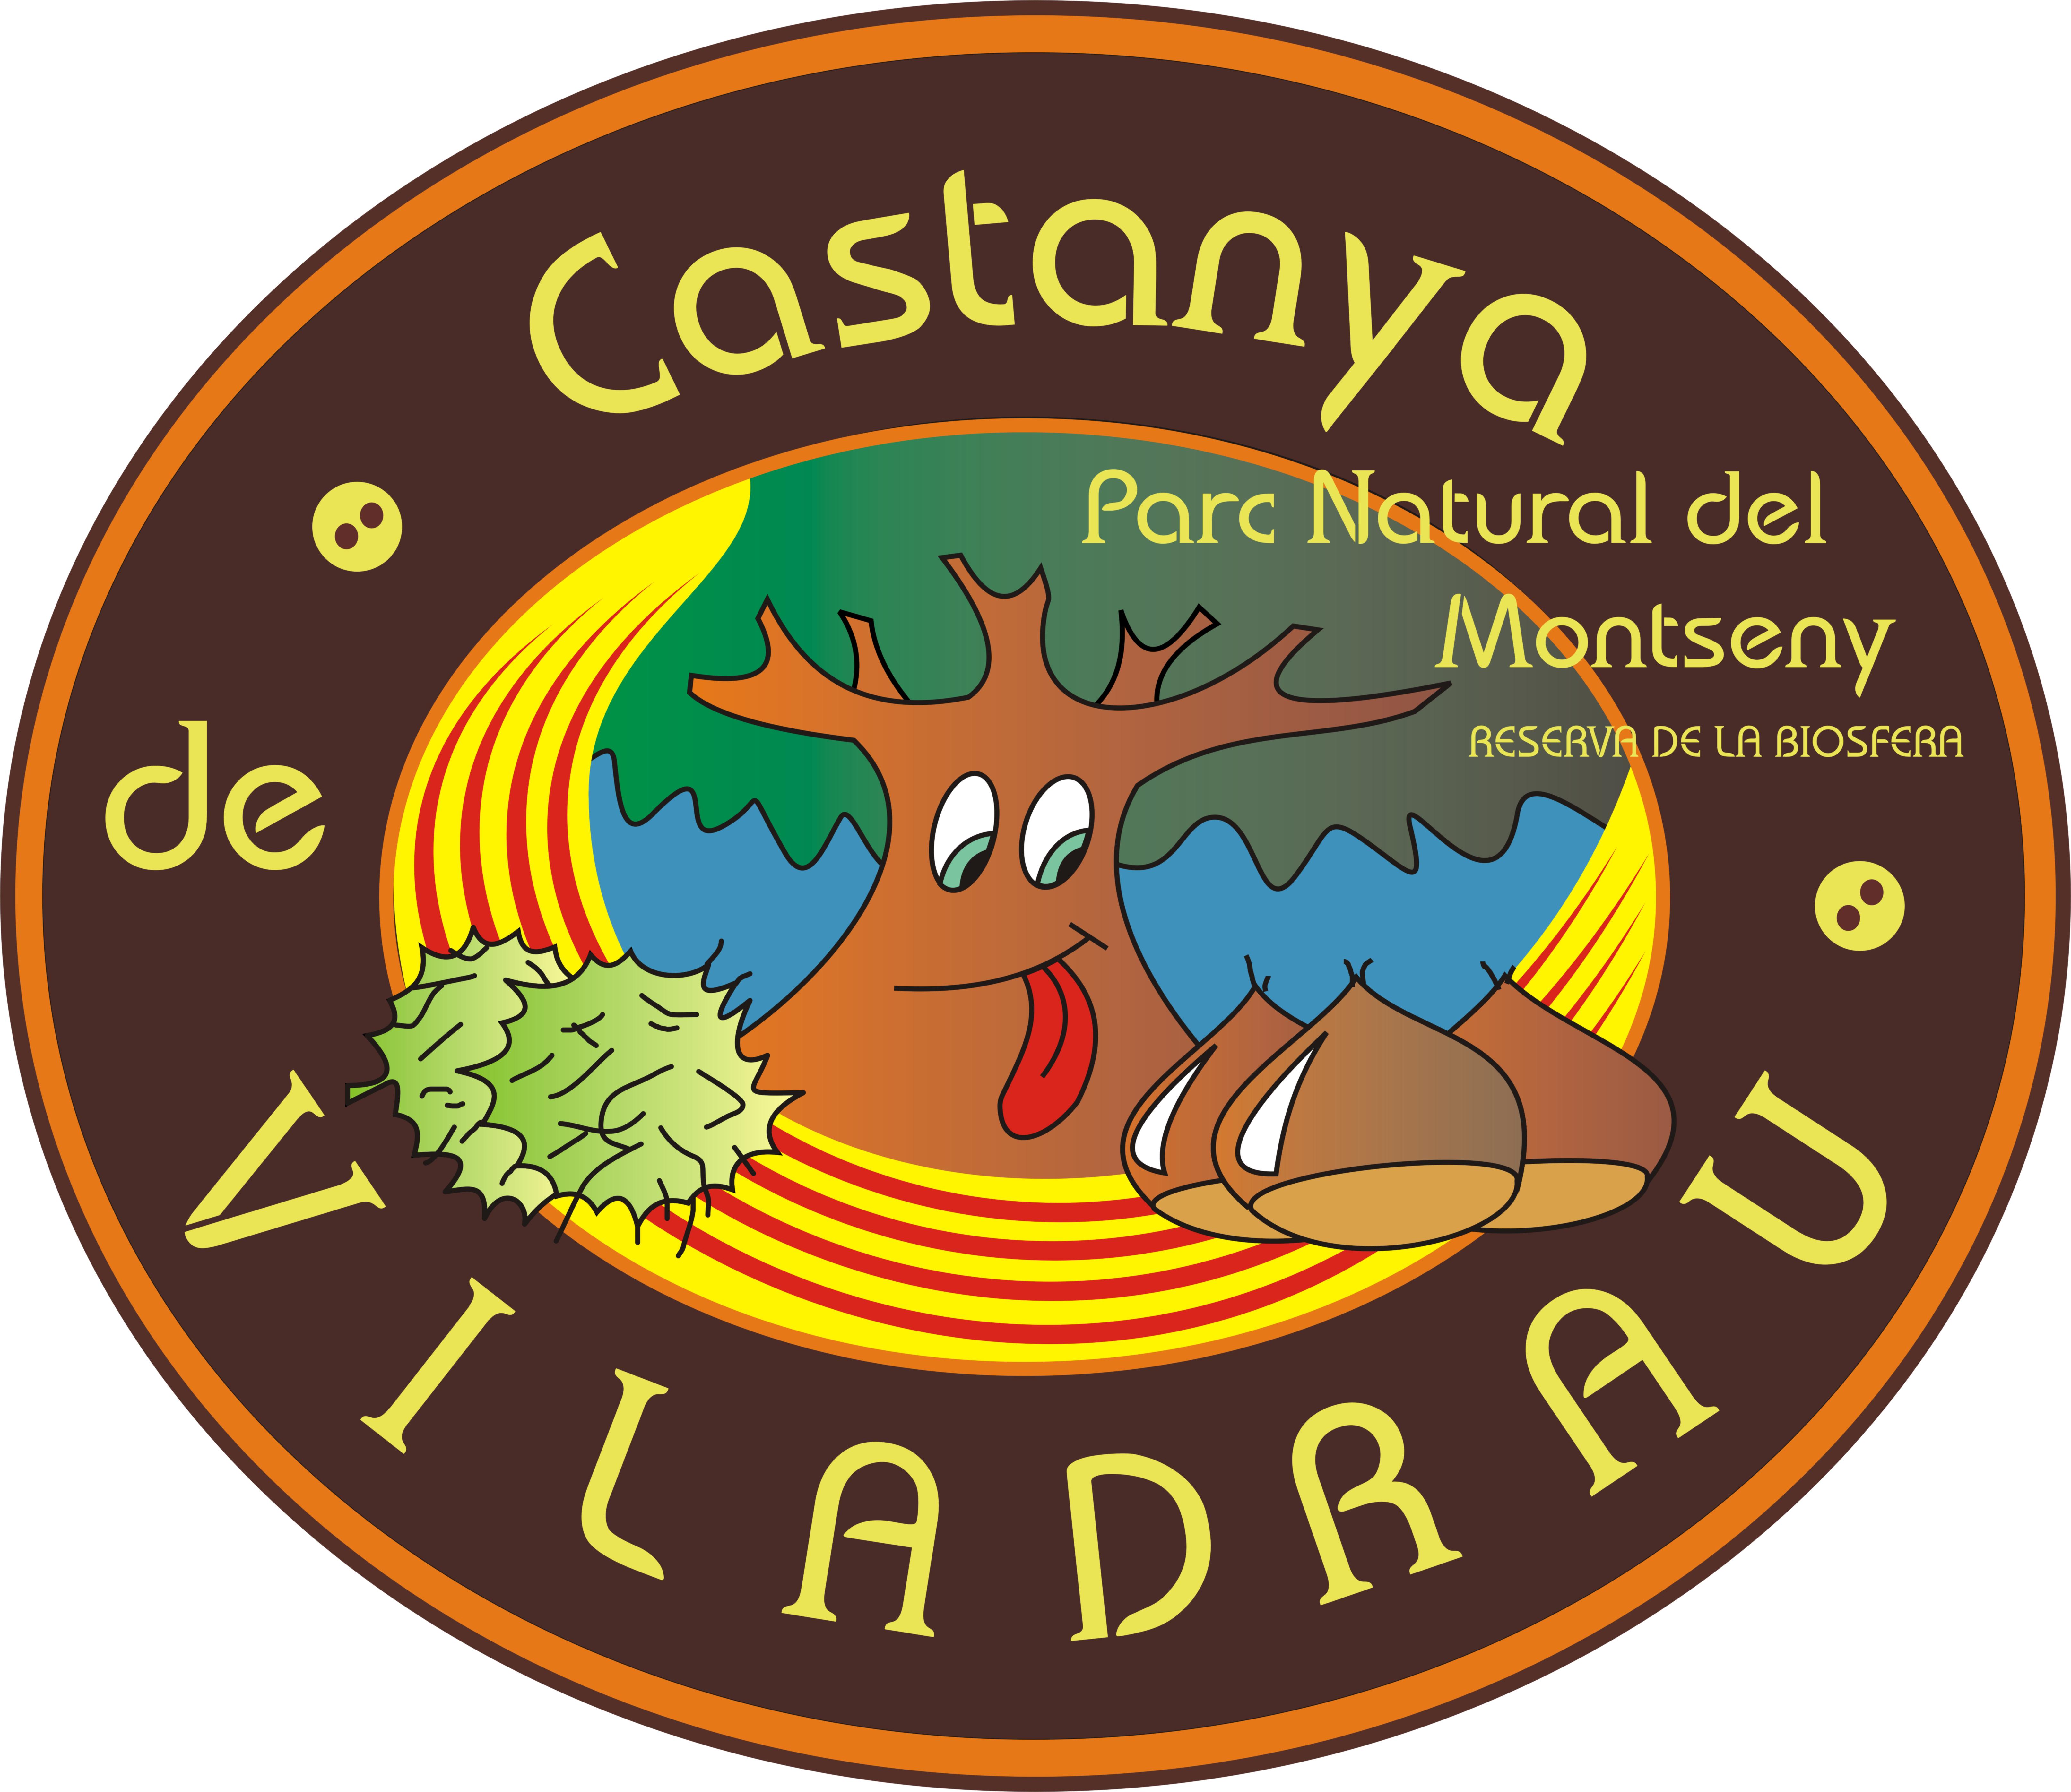 Castanya de Viladrau